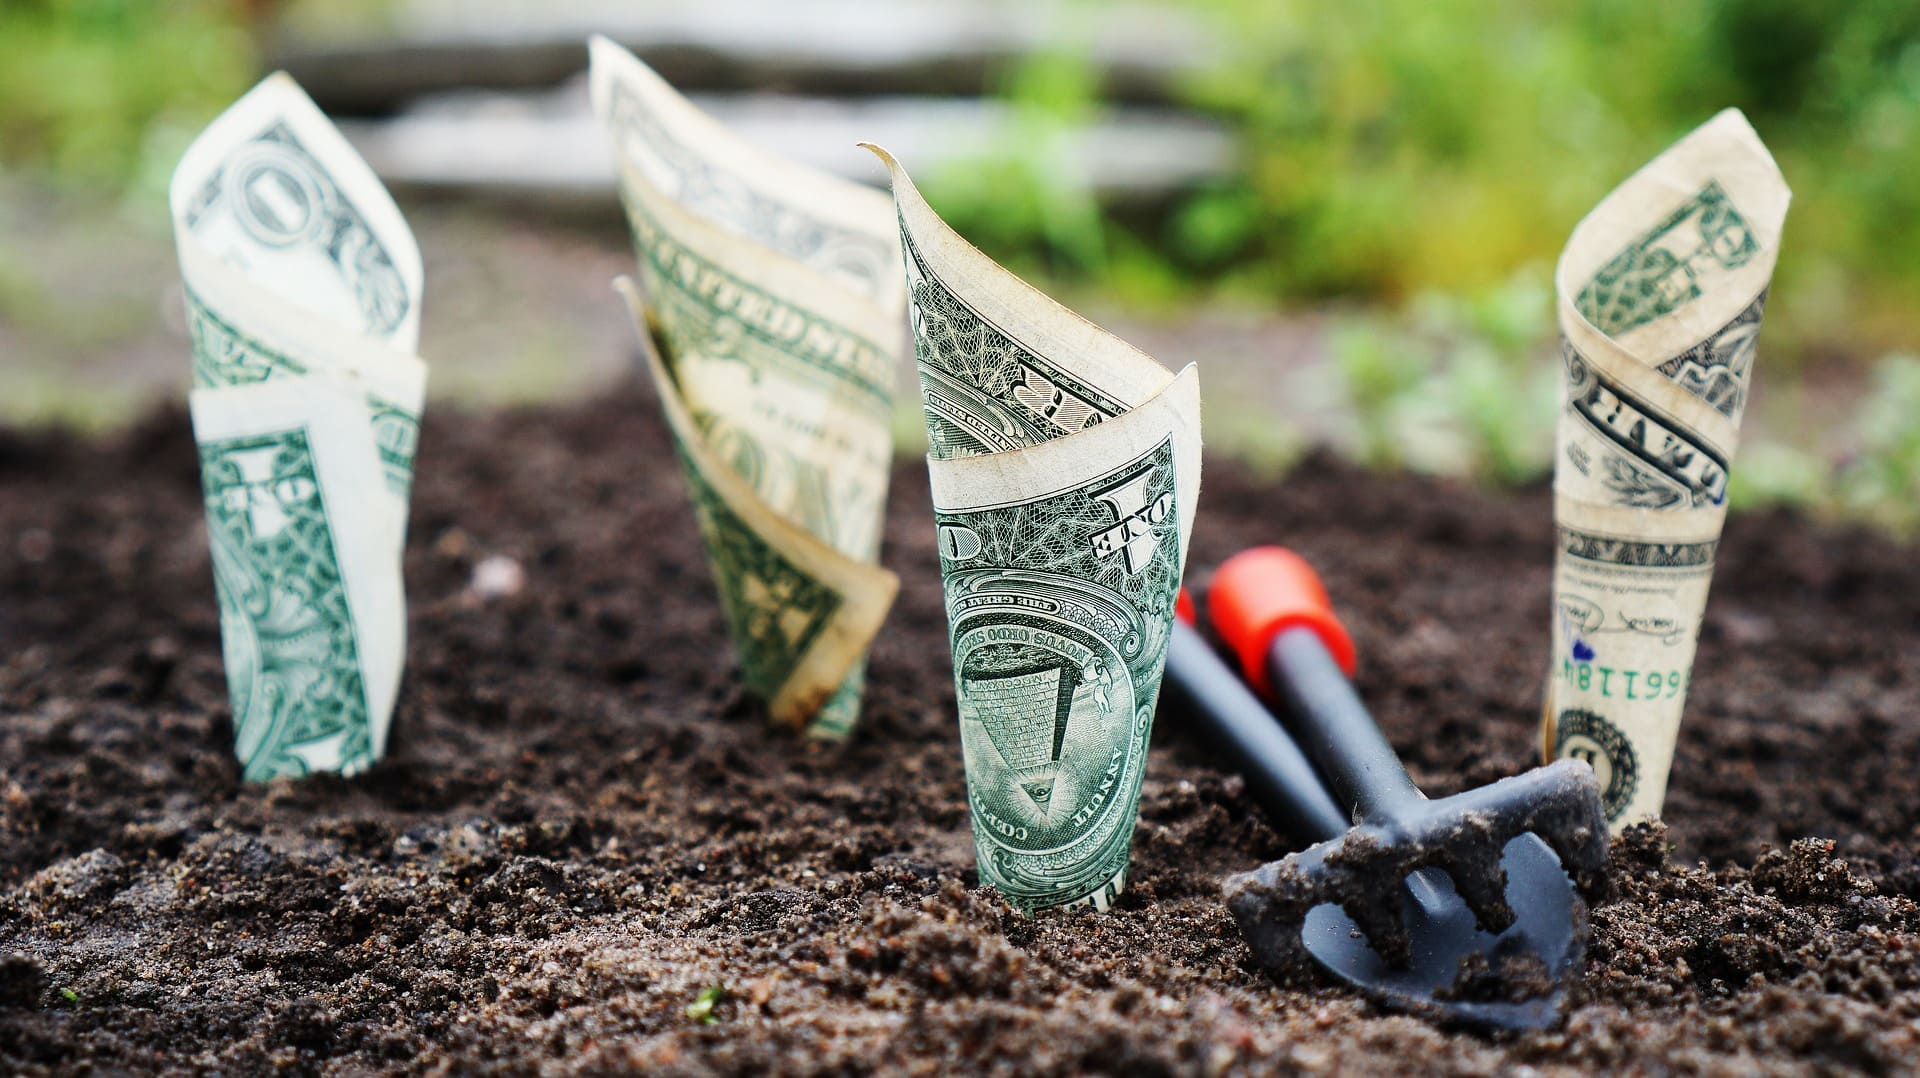 Digitales Nomadentum kostet Geld